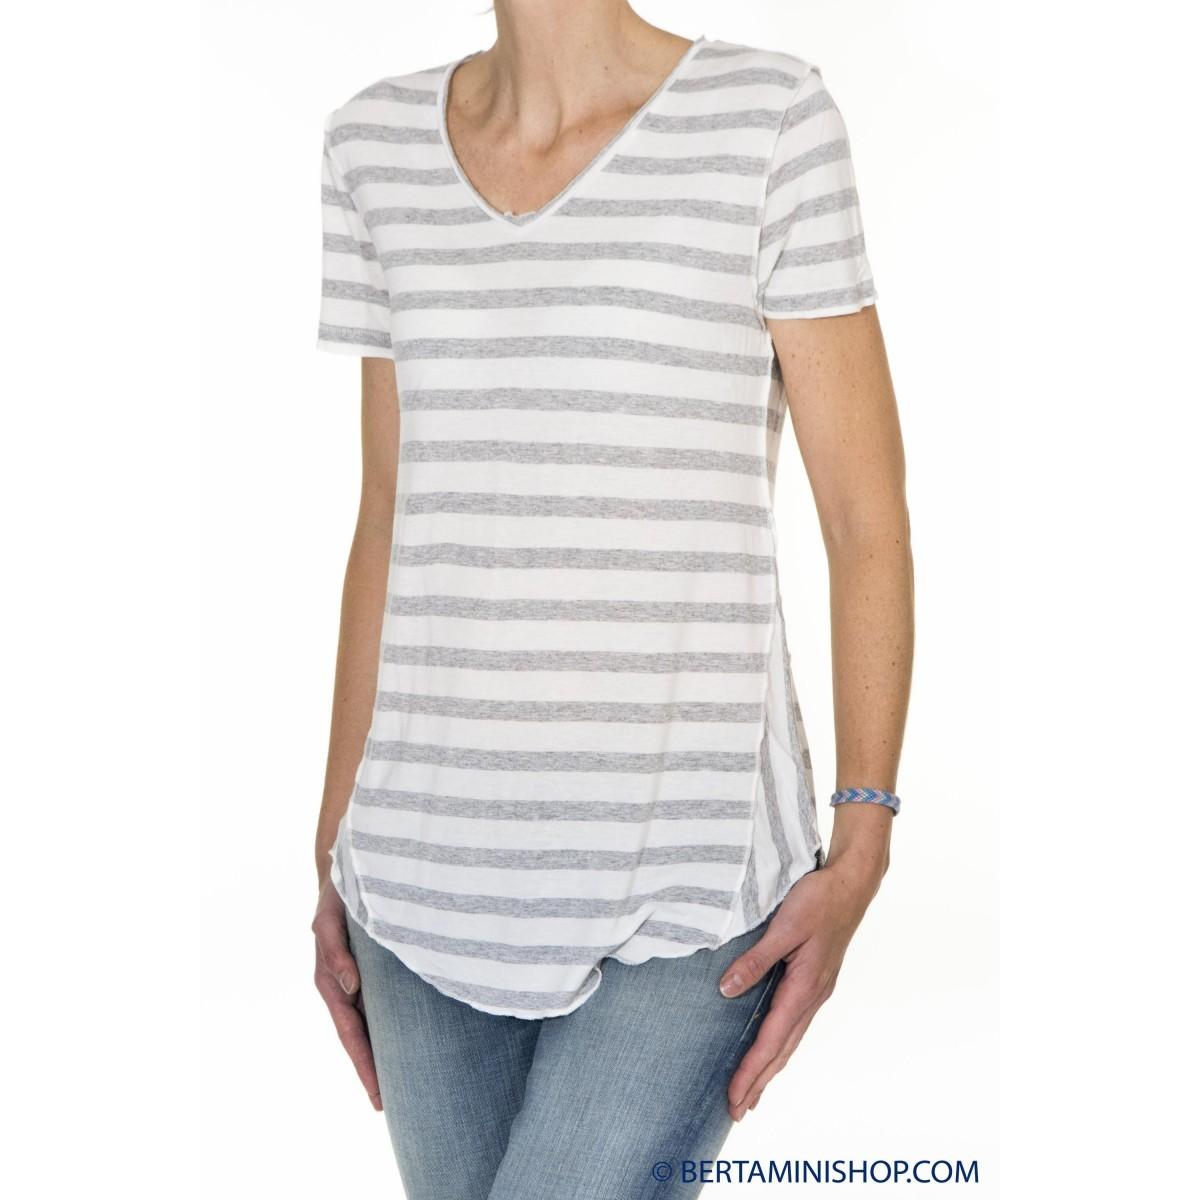 T-Shirt Better Rich Donna - F14 Tshirt Righe 9100 - Grigio bianco